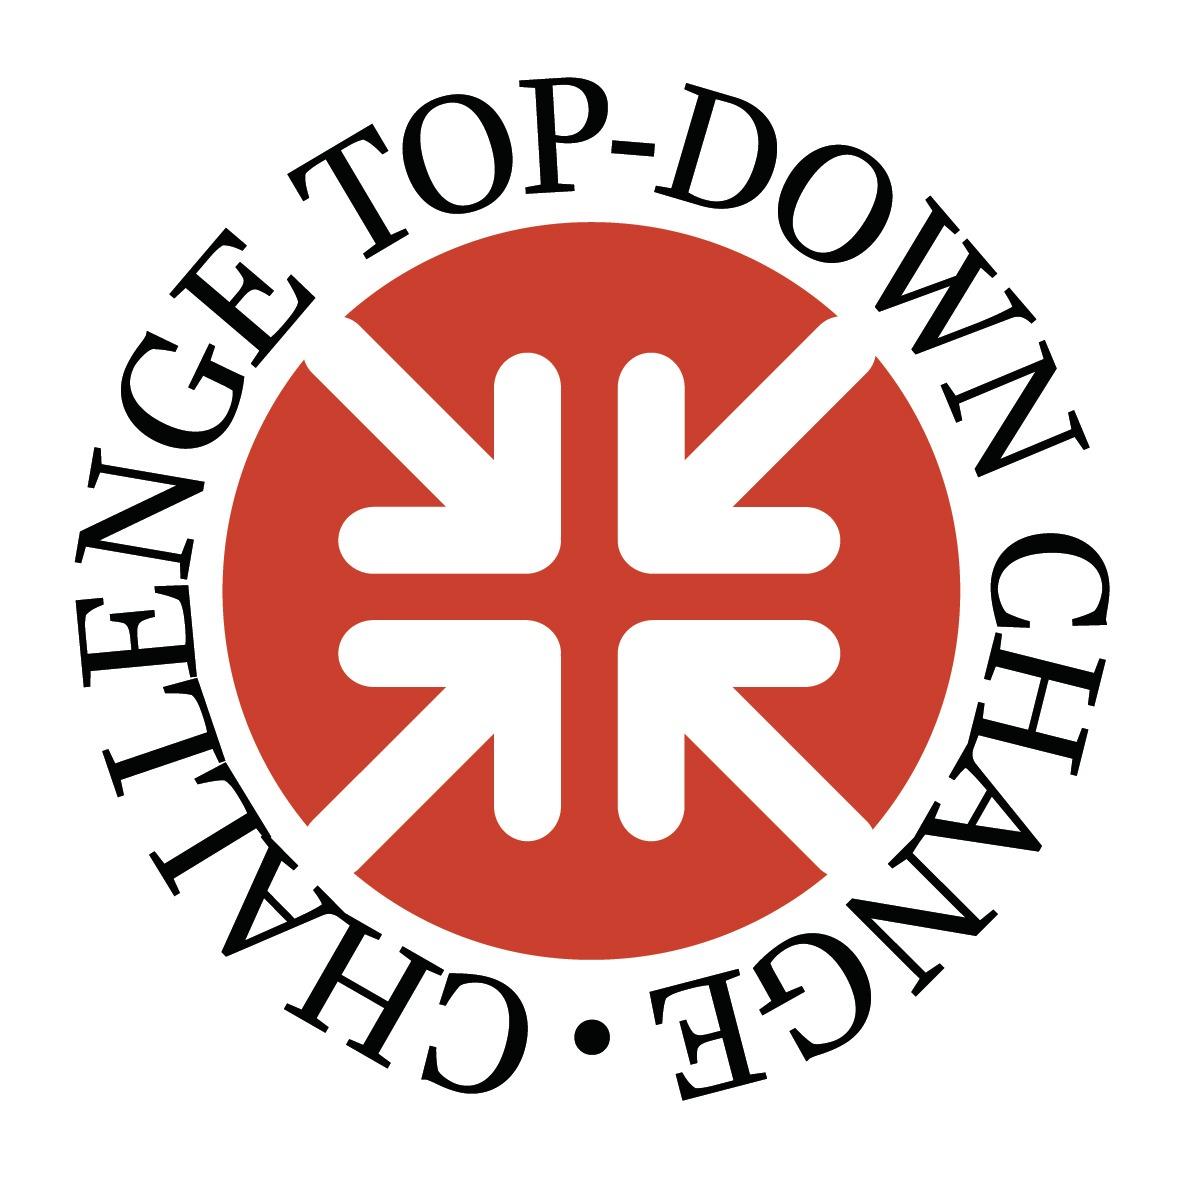 Challenge_Top_Down_Change_FINAL_PRINT